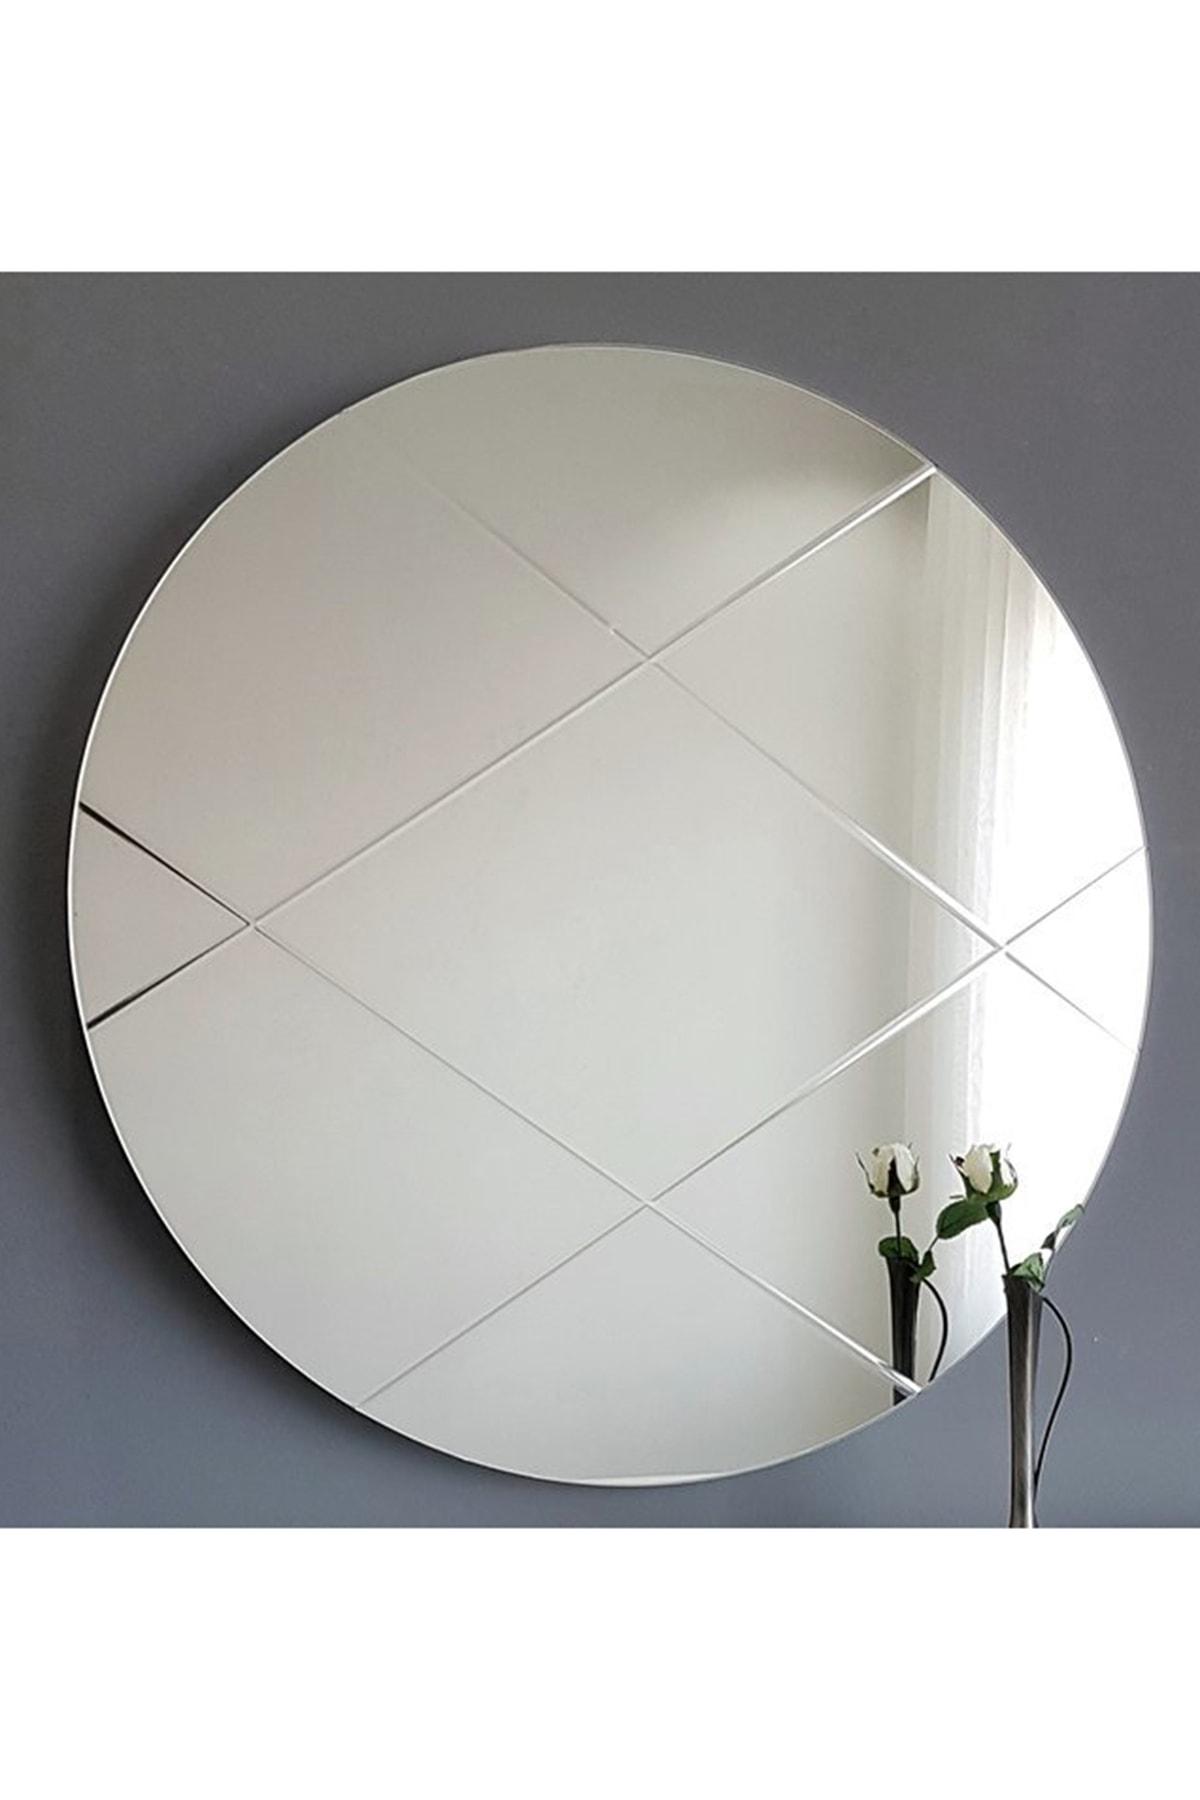 Vivense Neostill Yuvarlak Ayna Baklava Desen 60Cm 1